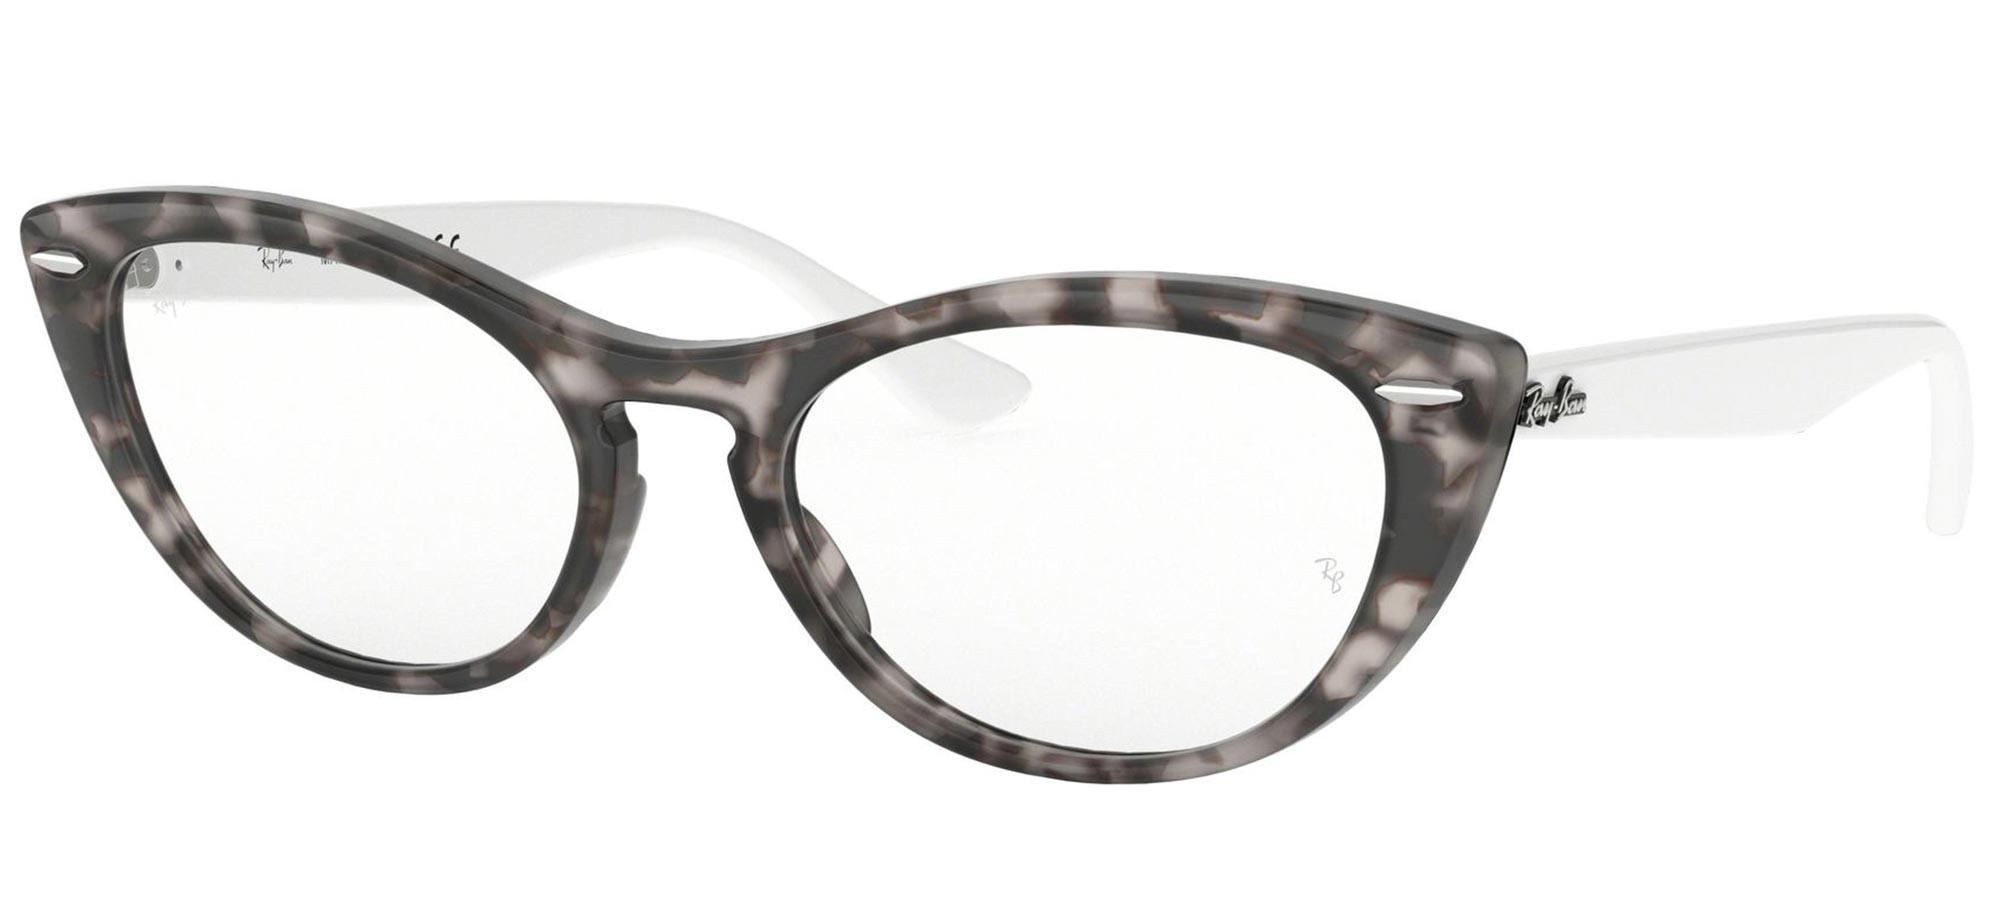 Ray-Ban eyeglasses RX 4314V